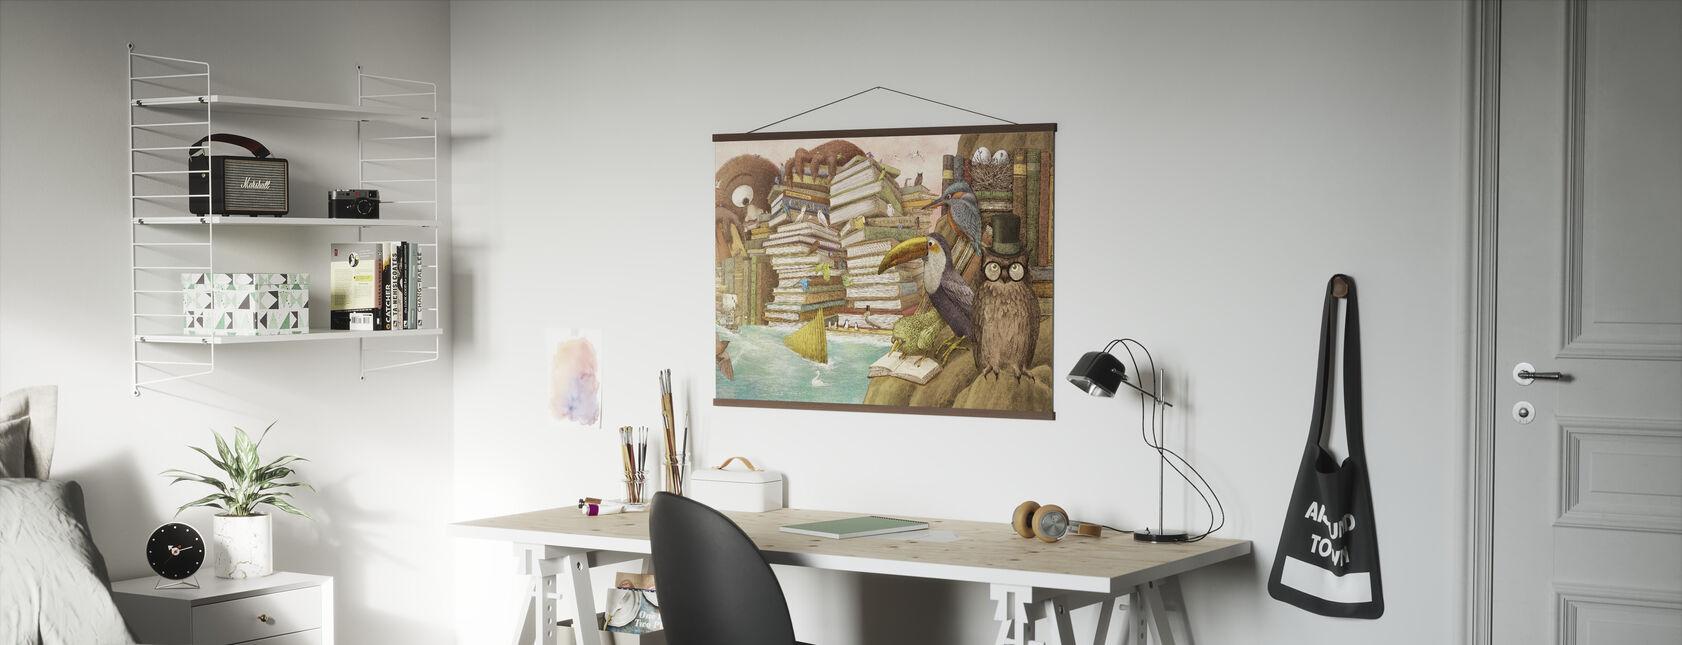 Ocean Meets Sky Library Islands - Poster - Office